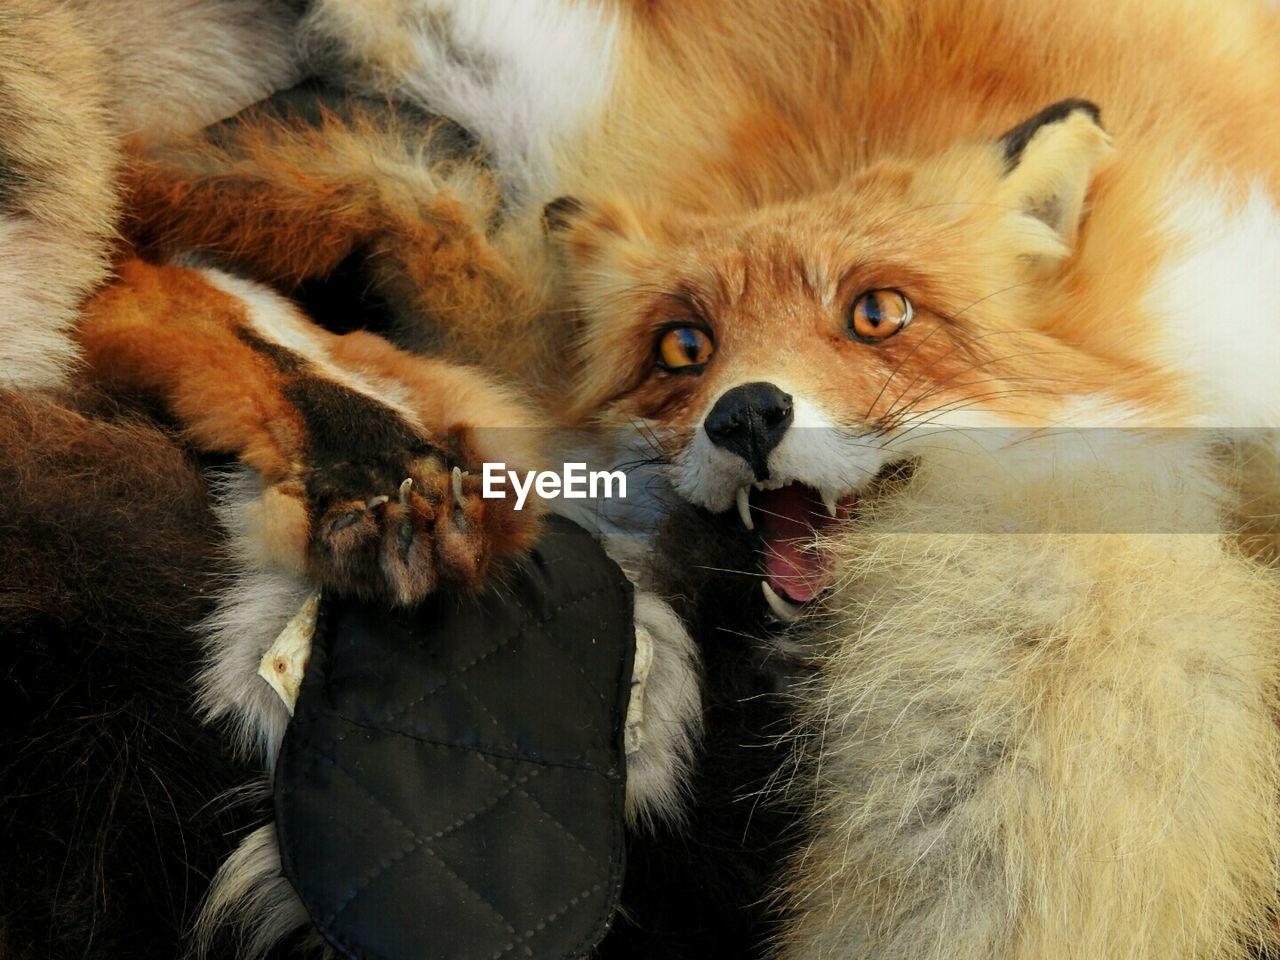 Fox taxidermy at home